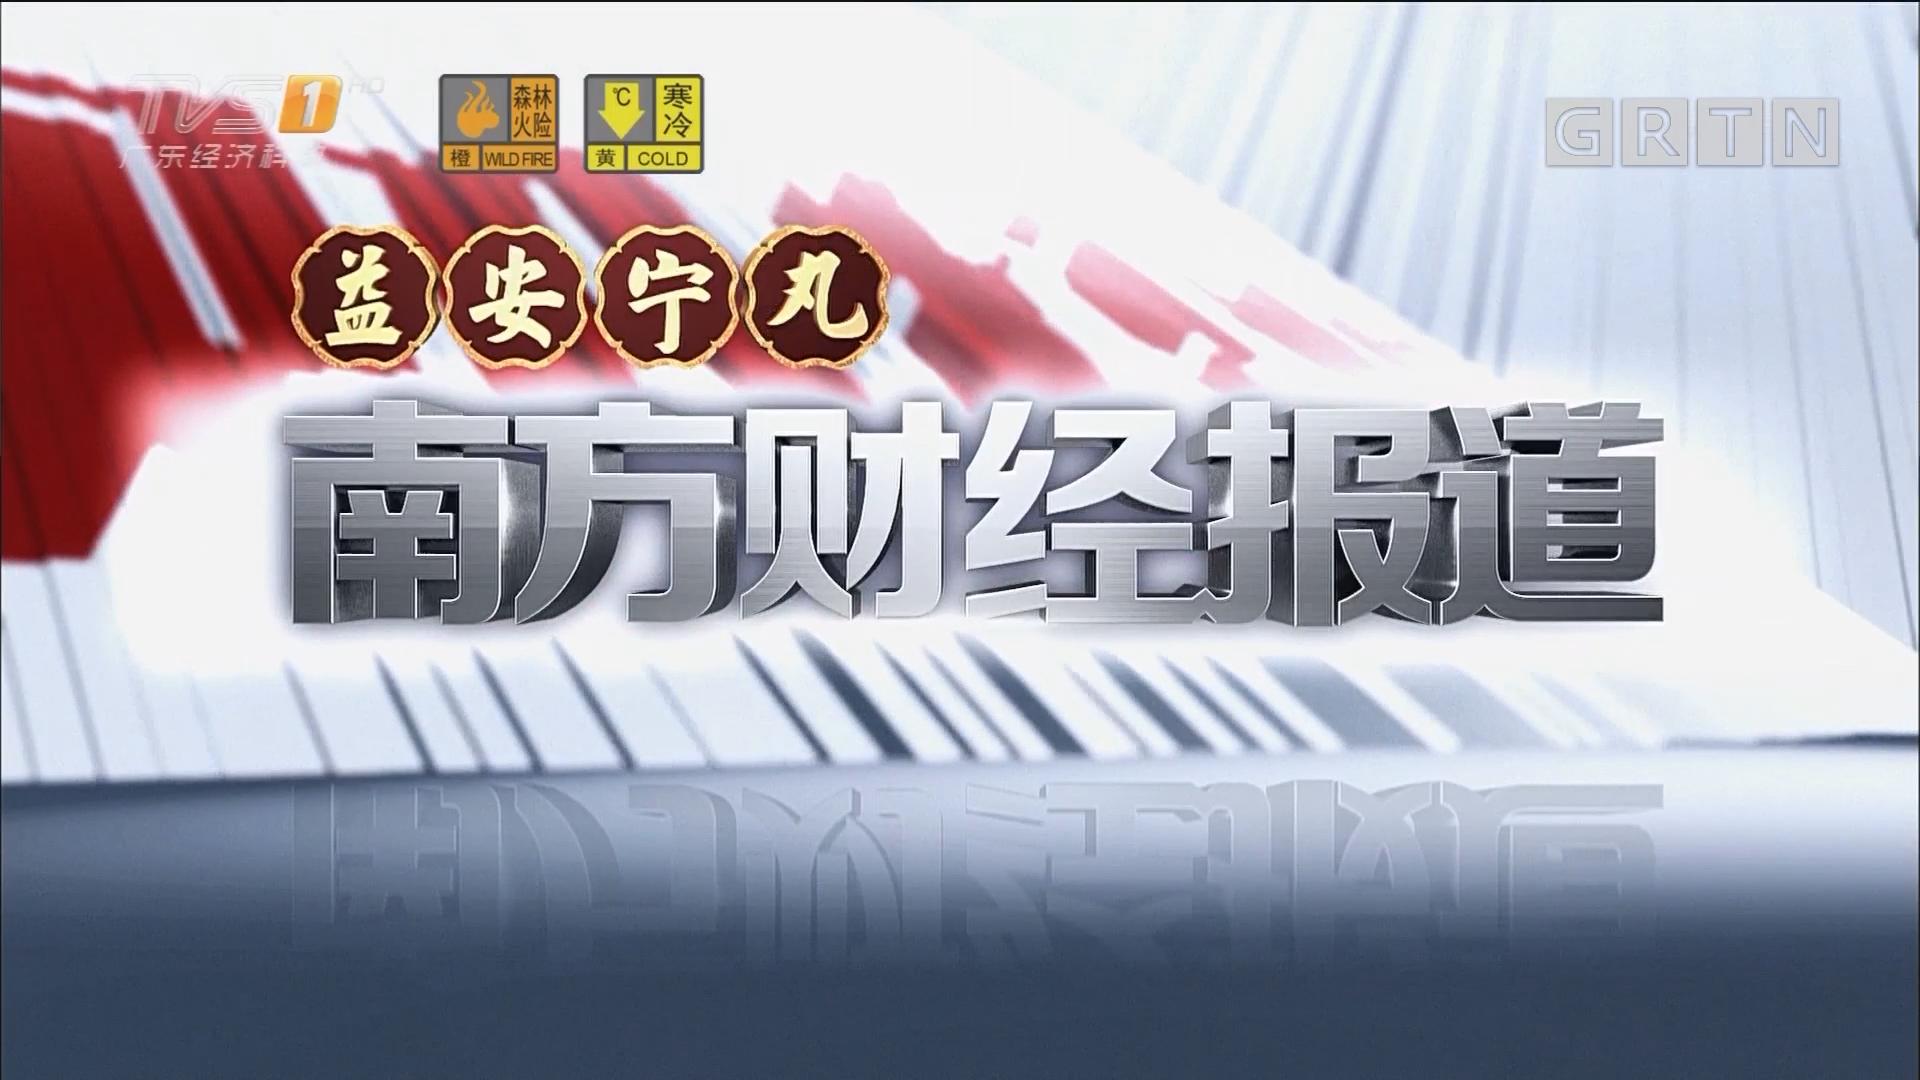 [HD][2017-12-16]南方财经报道:一大波冷空气在路上 广东多地发布寒冷预警